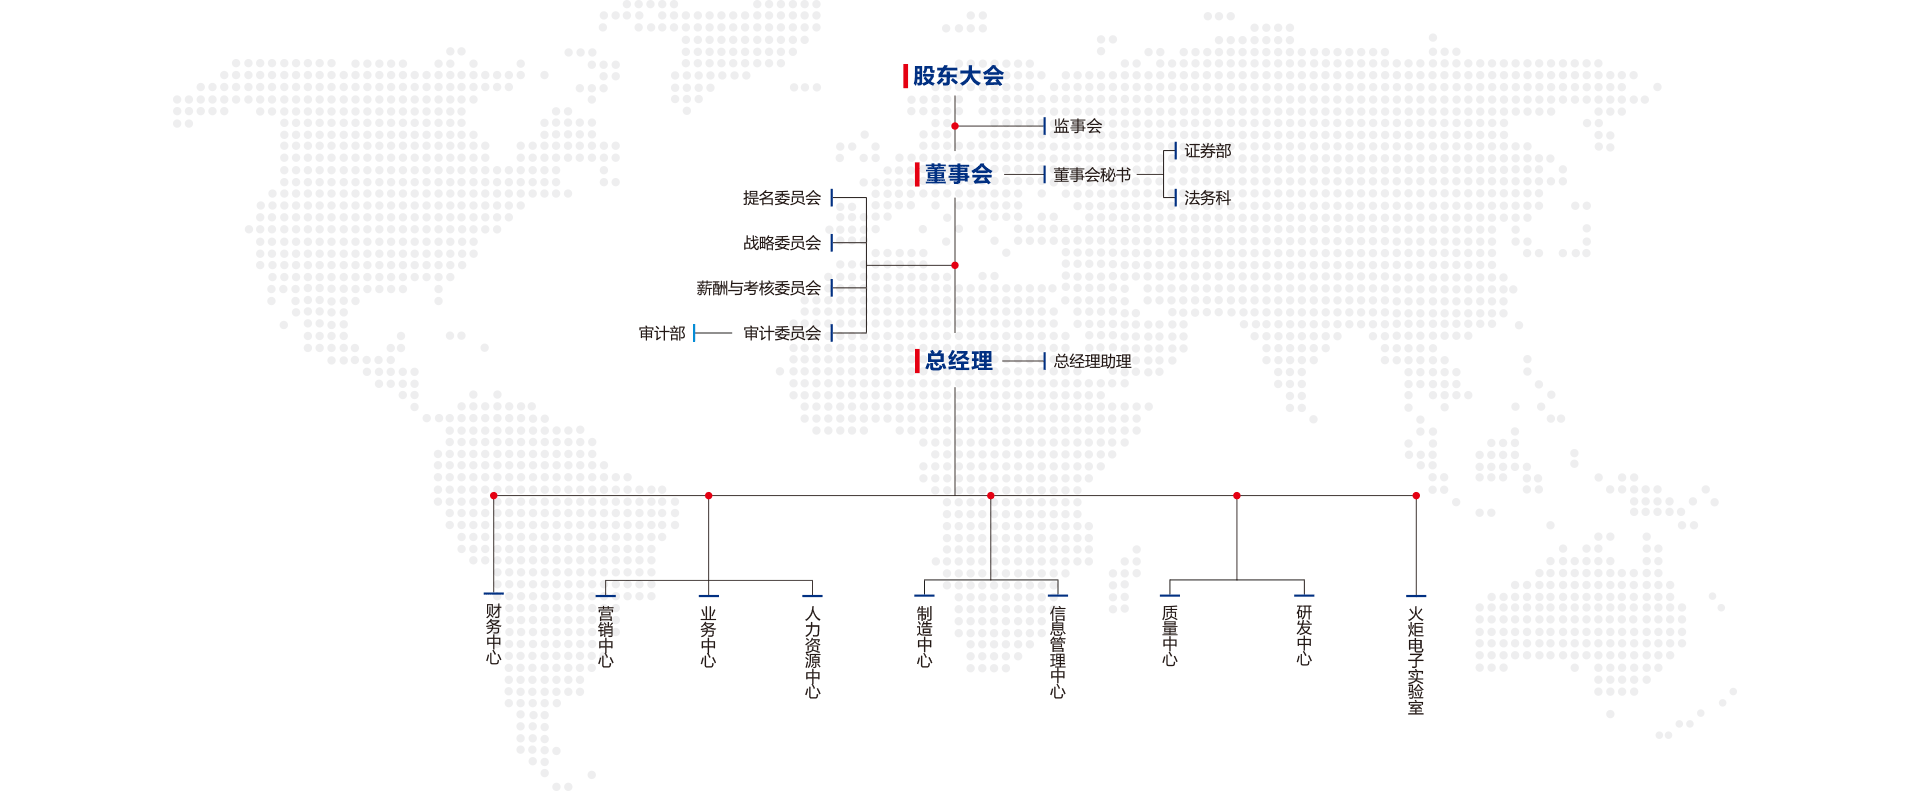 公司组织结构图20170816.png